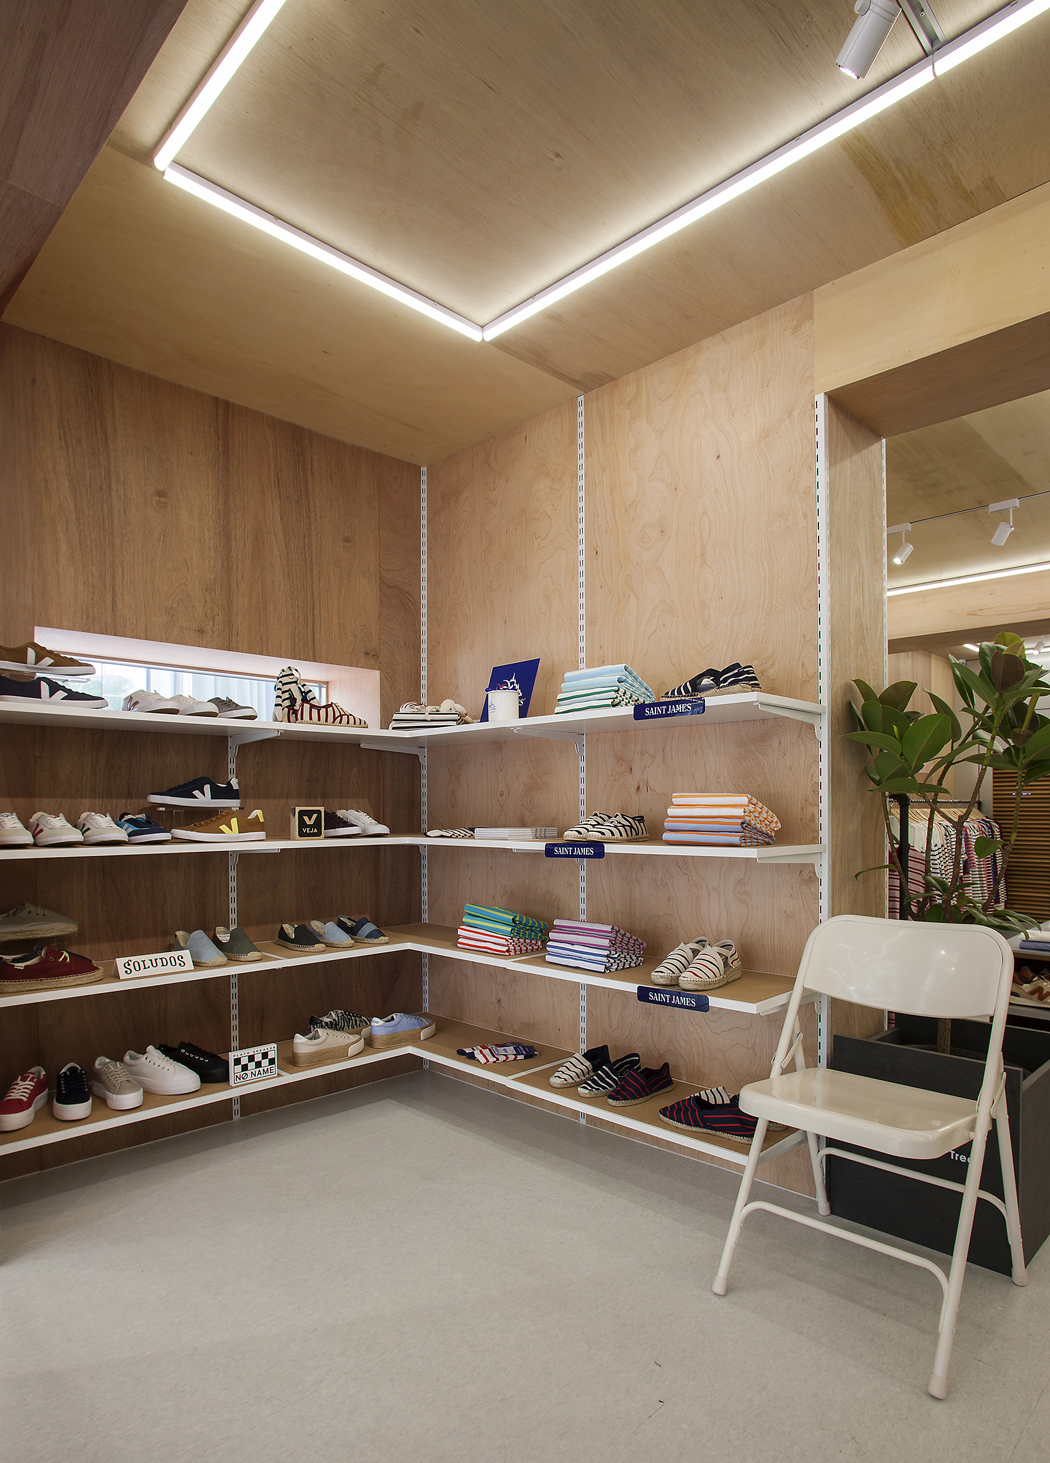 PLATFORM PLACE HANNAM Store_Interior (5)